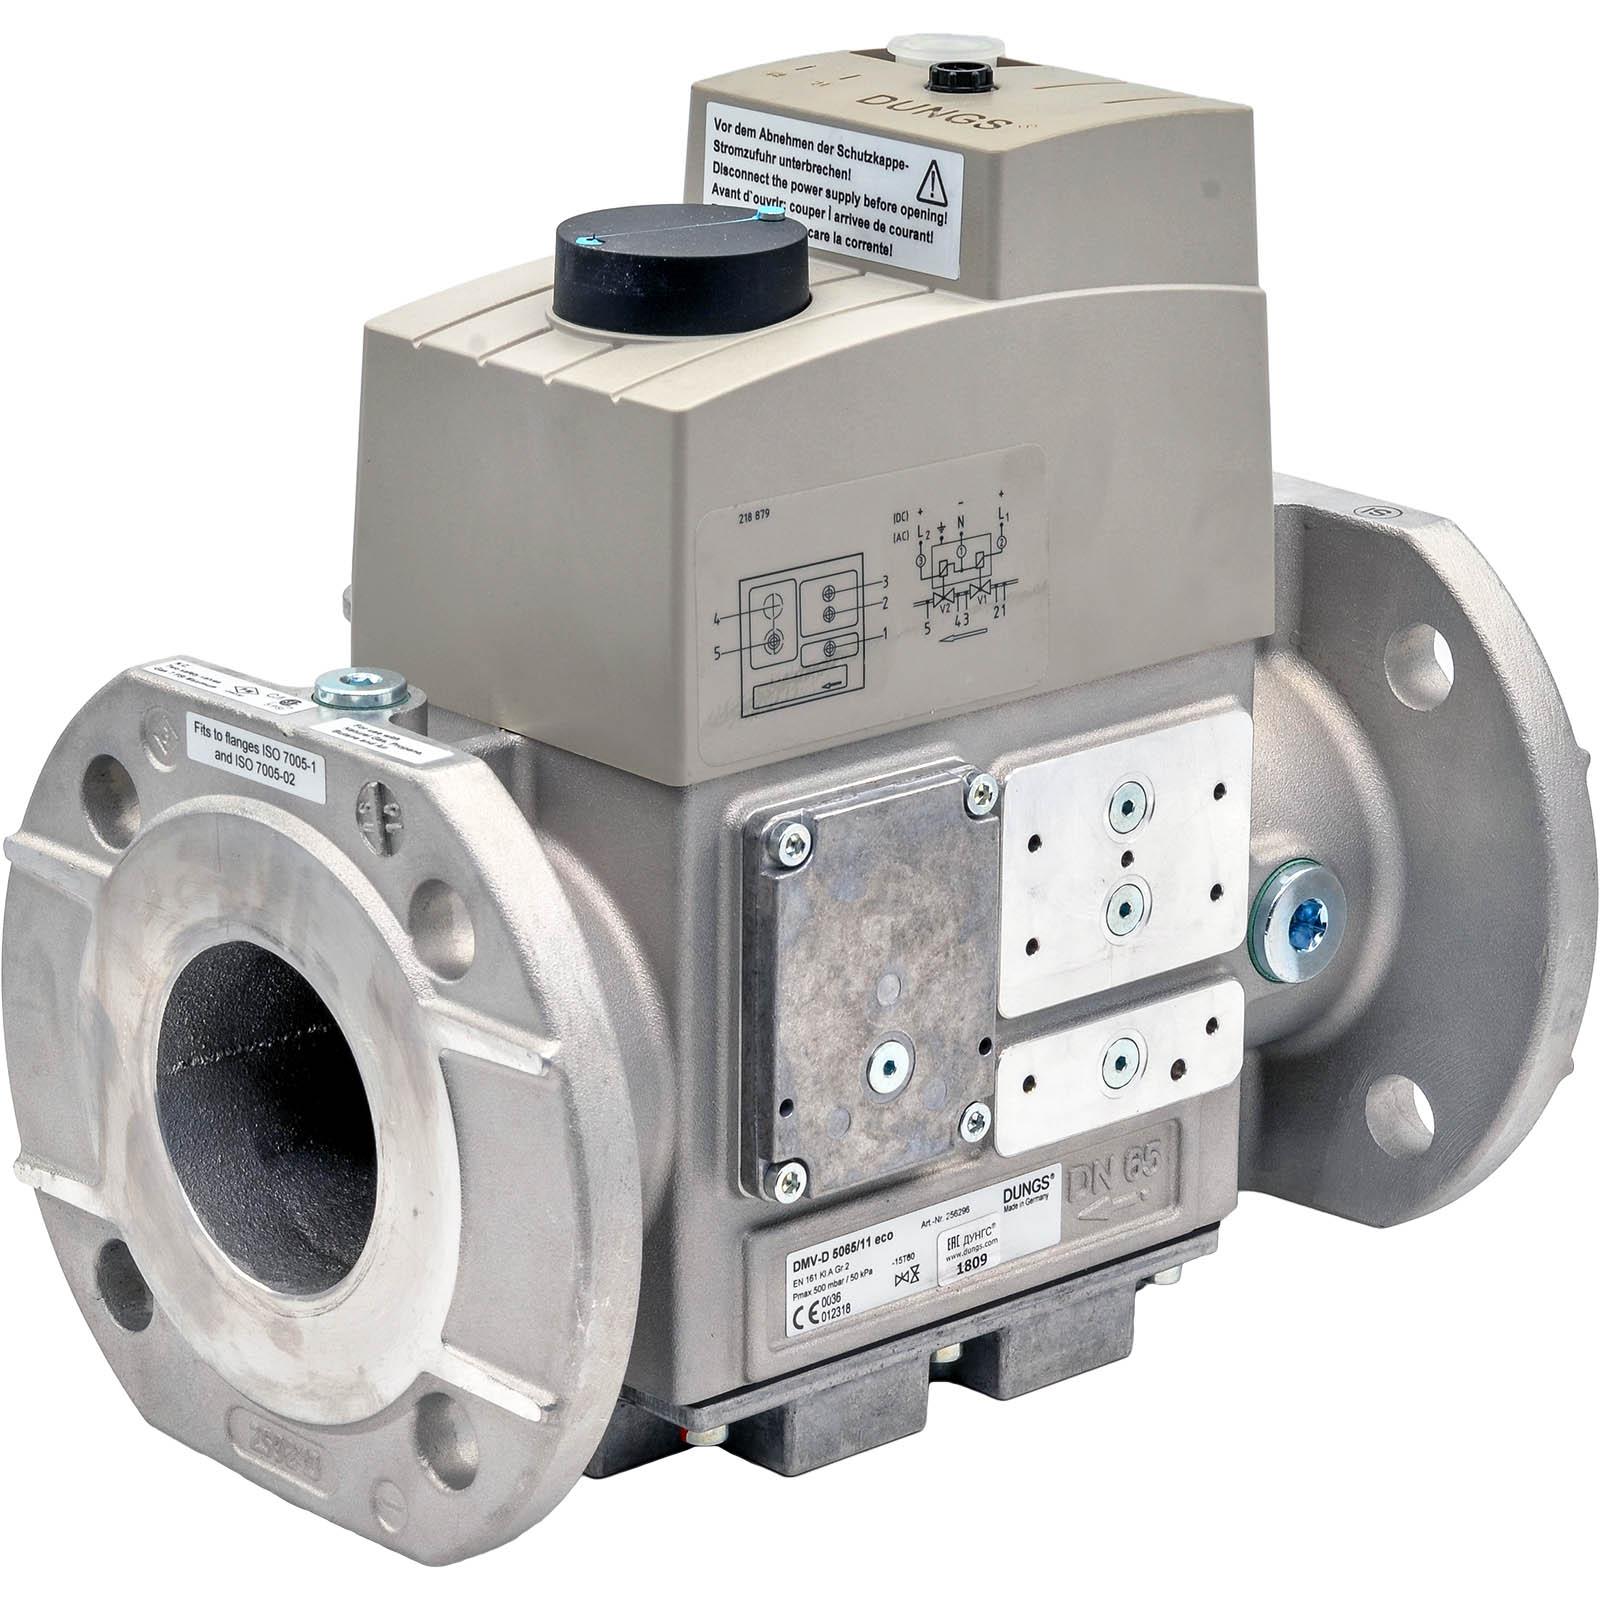 DMV 5065/11 eco арт.256293 Двойной электромагнитный клапан DUNGS